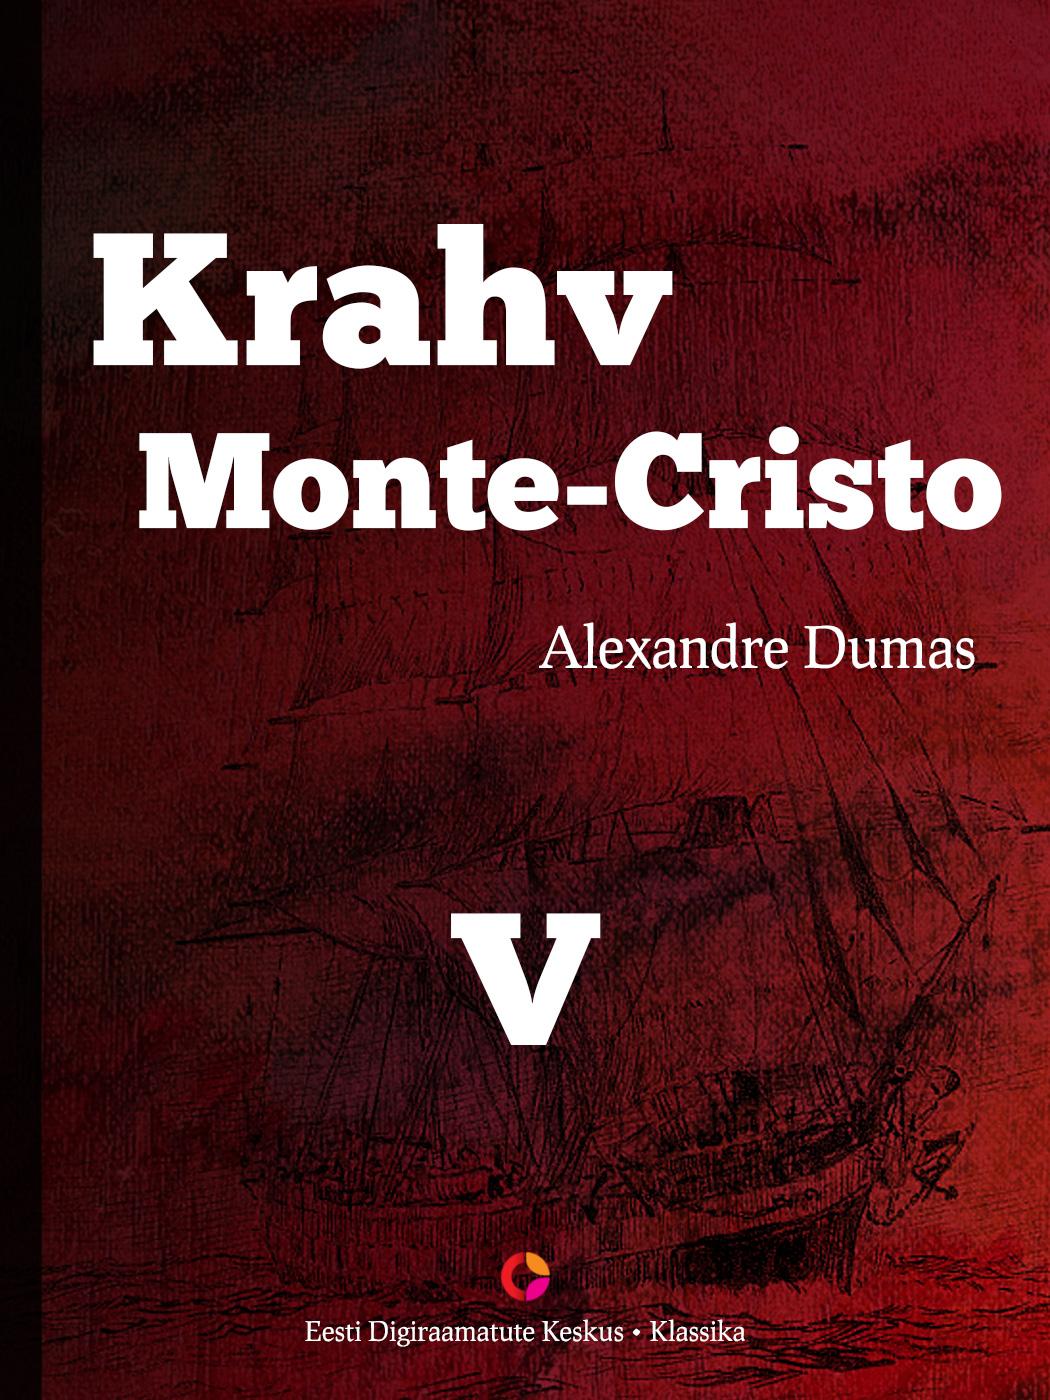 Alexandre Dumas Krahv Monte-Cristo. 5. osa ivar sinimets ungari kirjandus mitteungarlasele